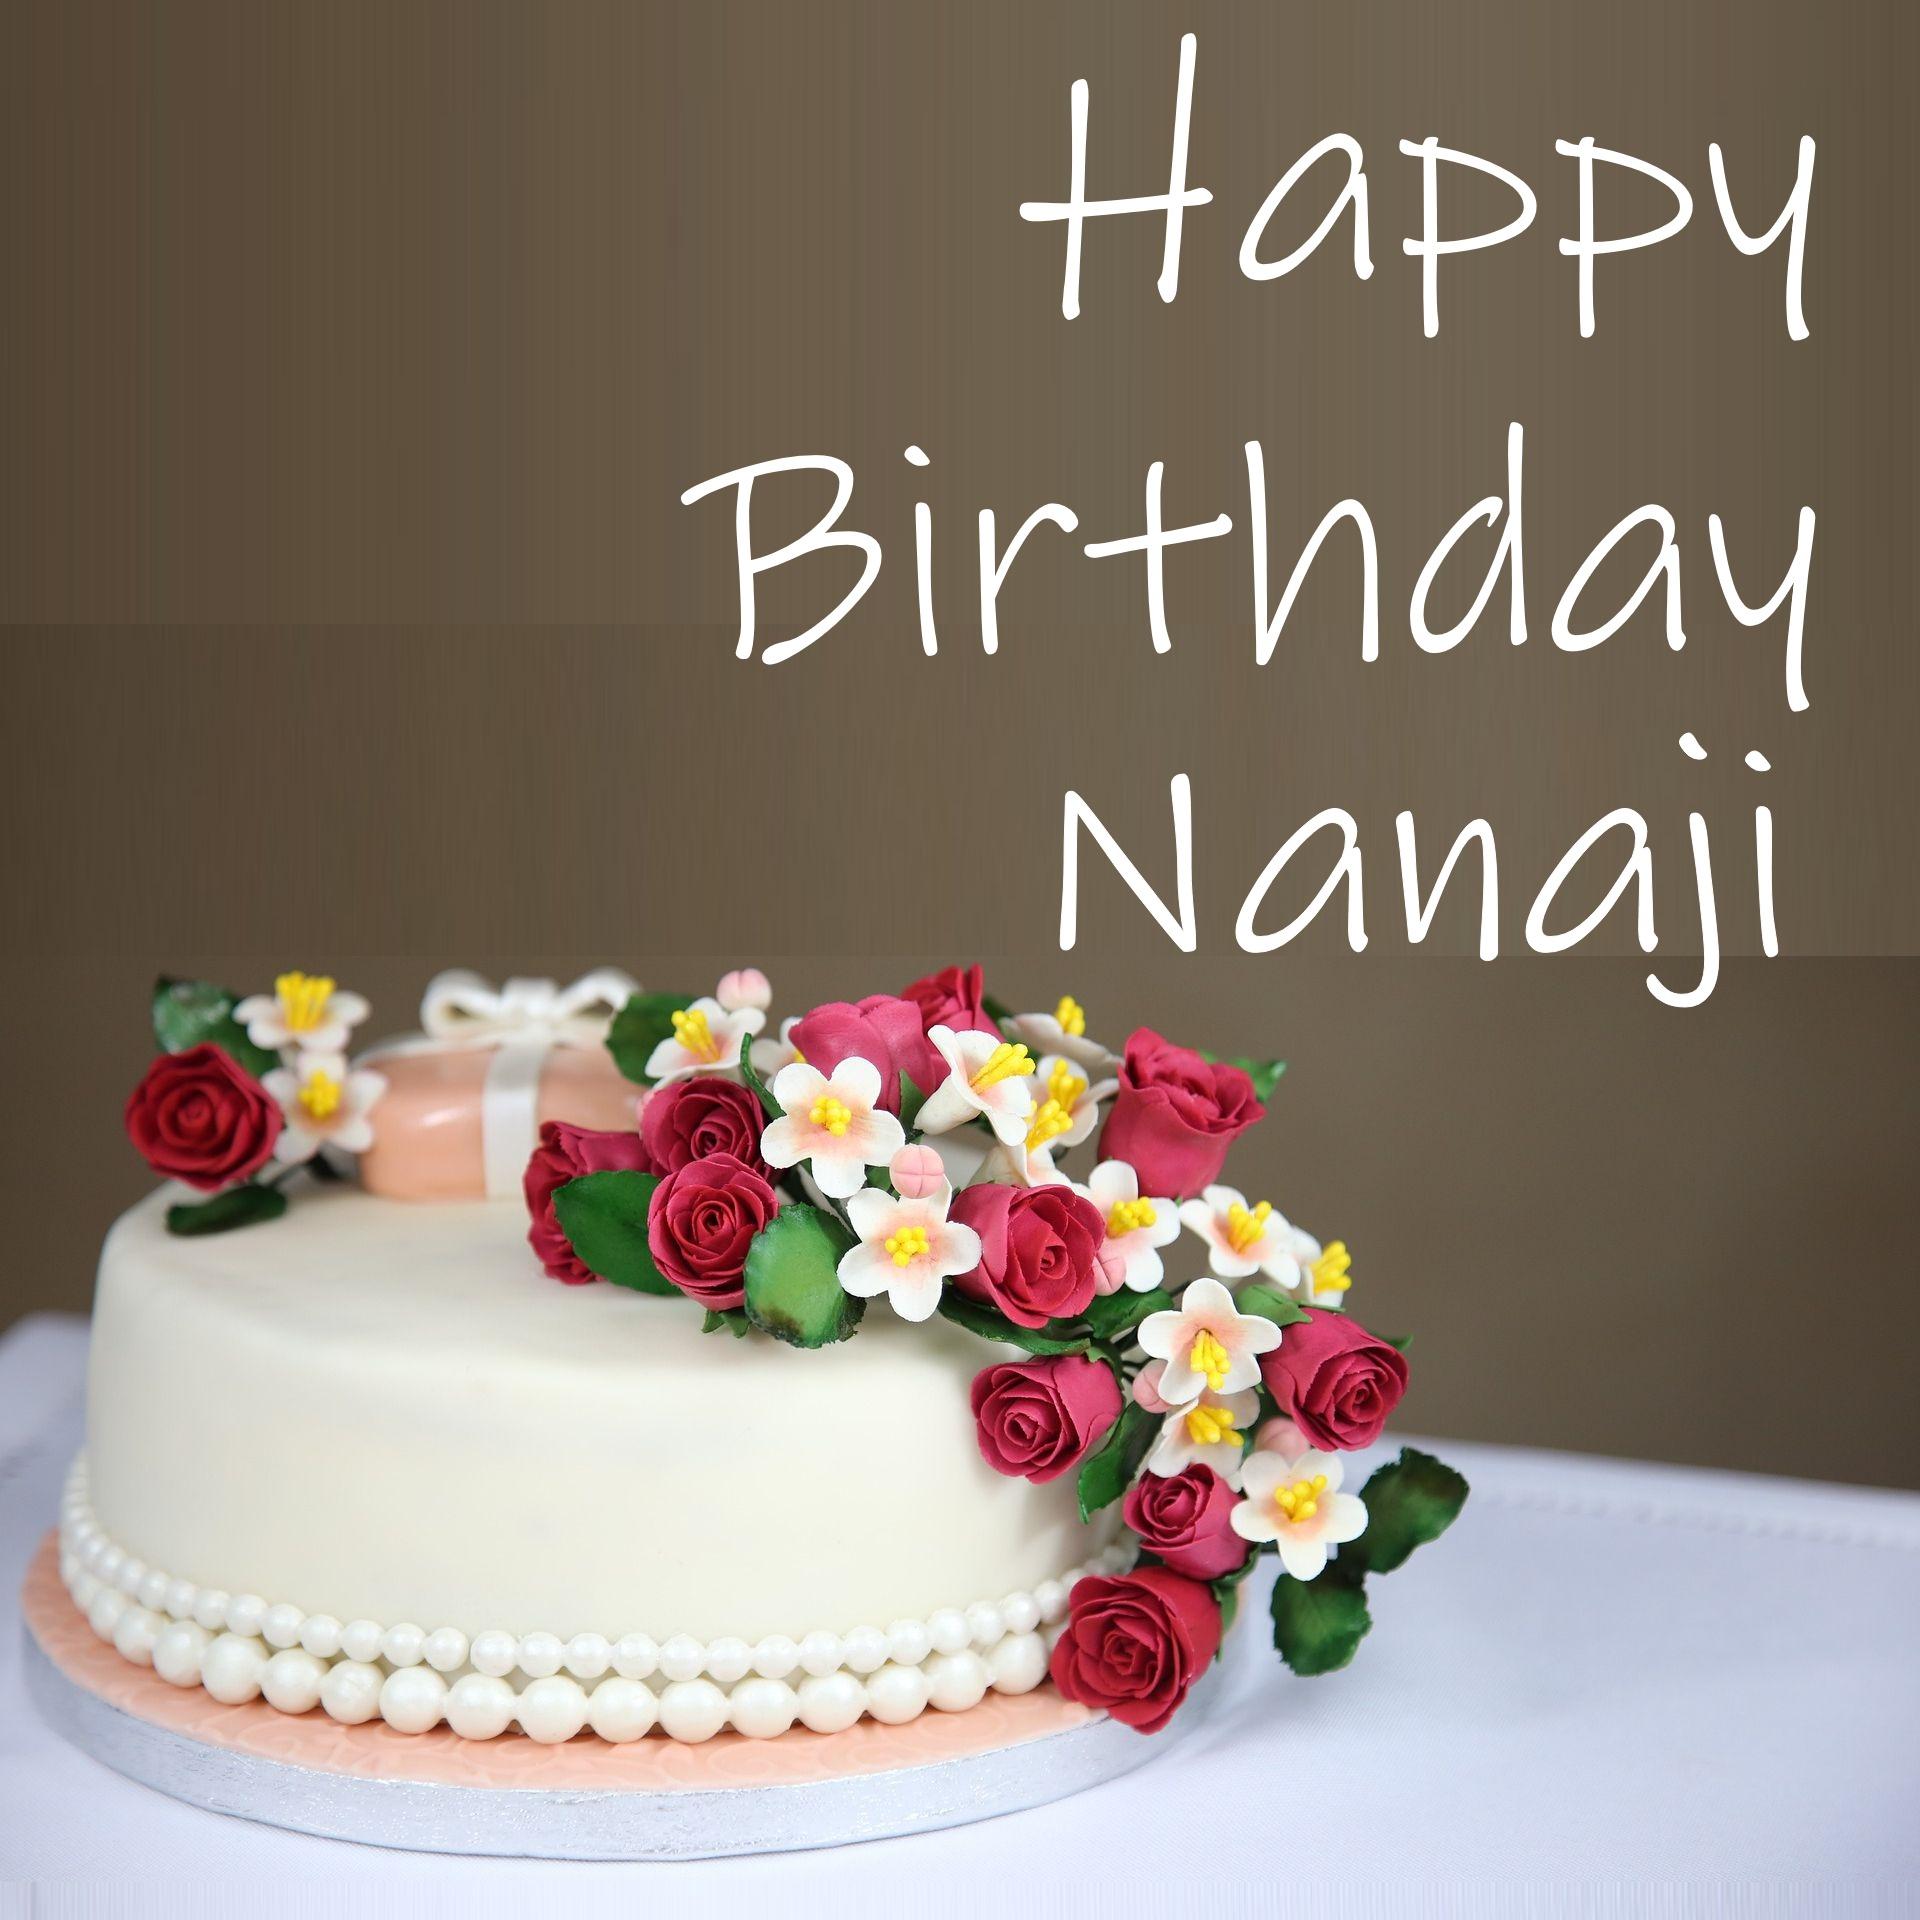 50 Best Geburtstag Bilder Fur Nanaji Sofort Download Wishiy Com